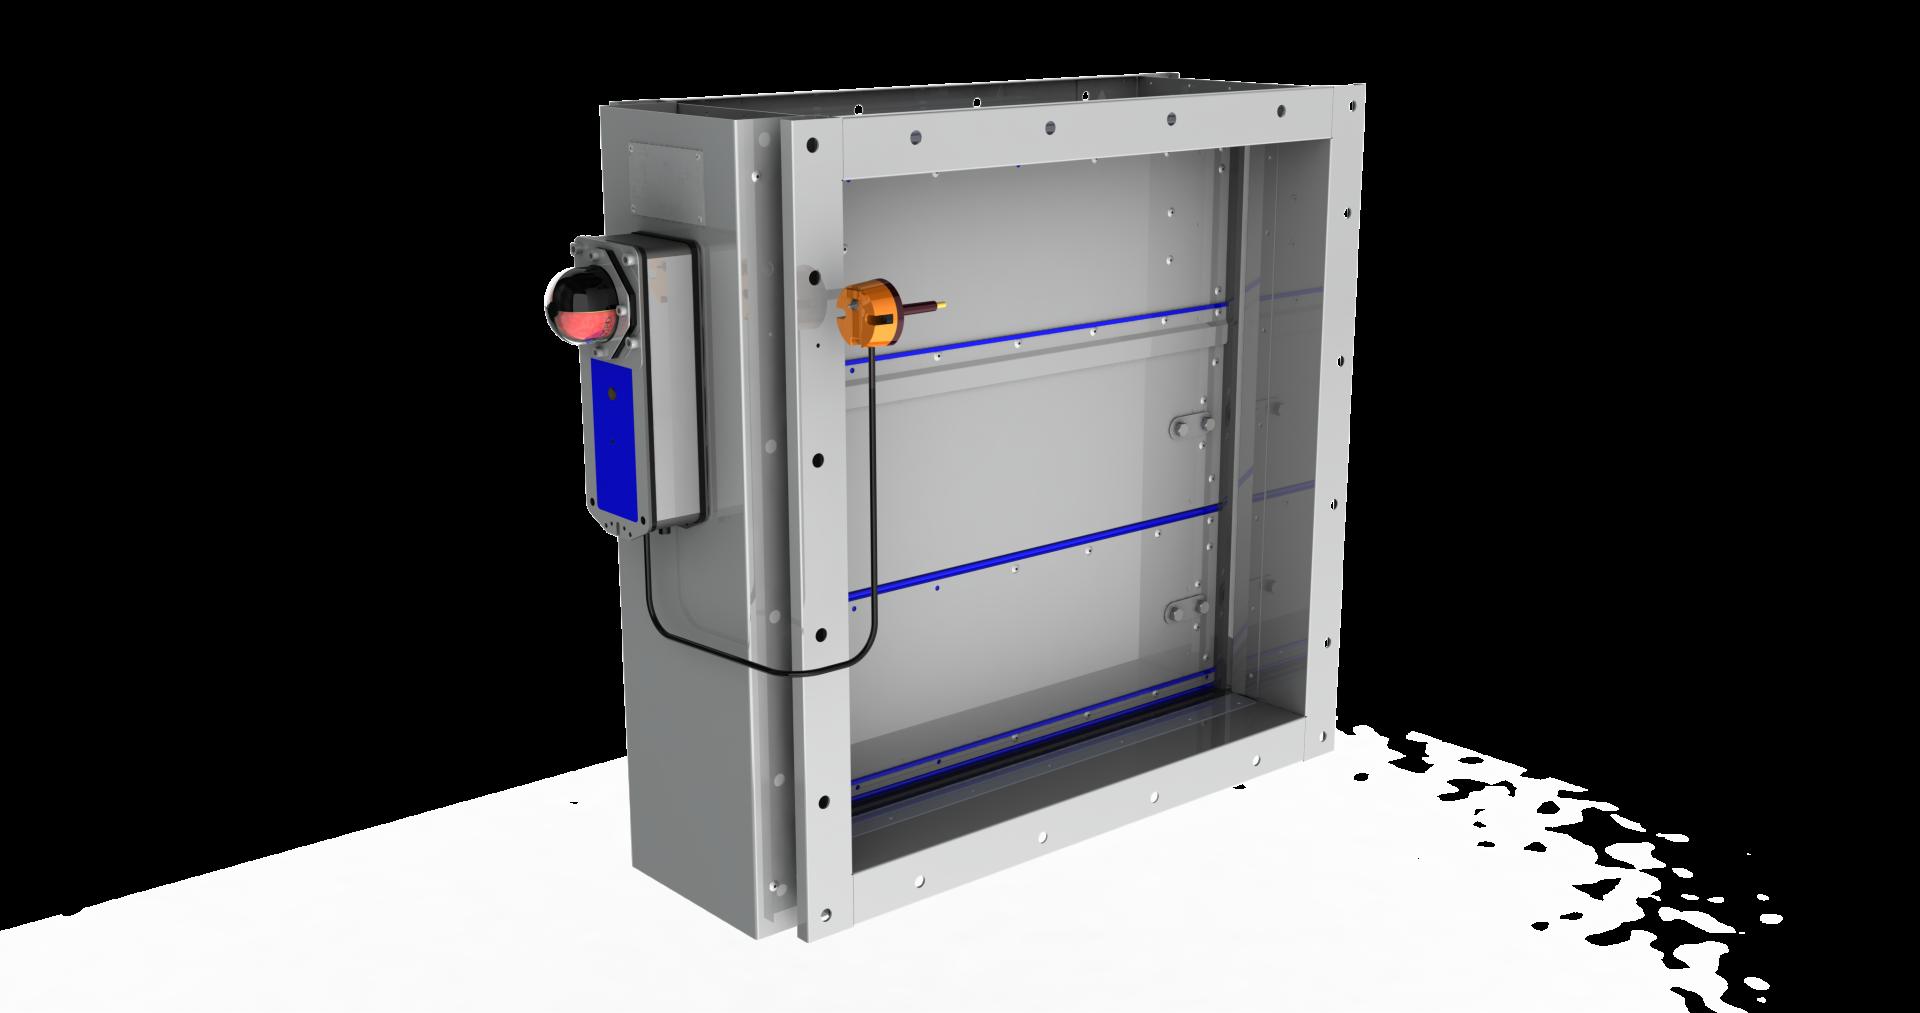 FCE - Fire damper (EI 60 S)